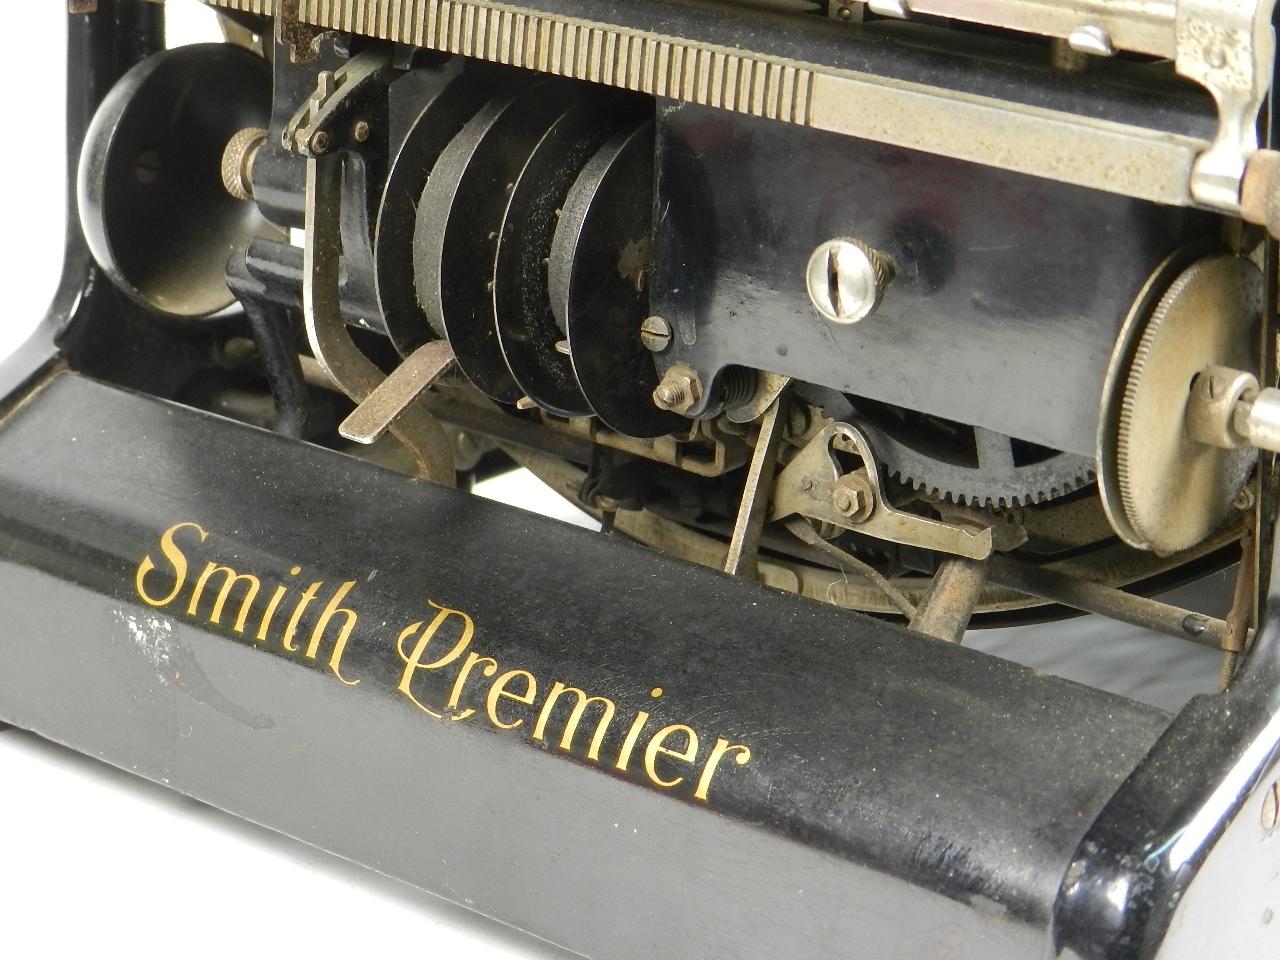 Imagen SMITH PREMIER Nº10  AÑO 1910 27633